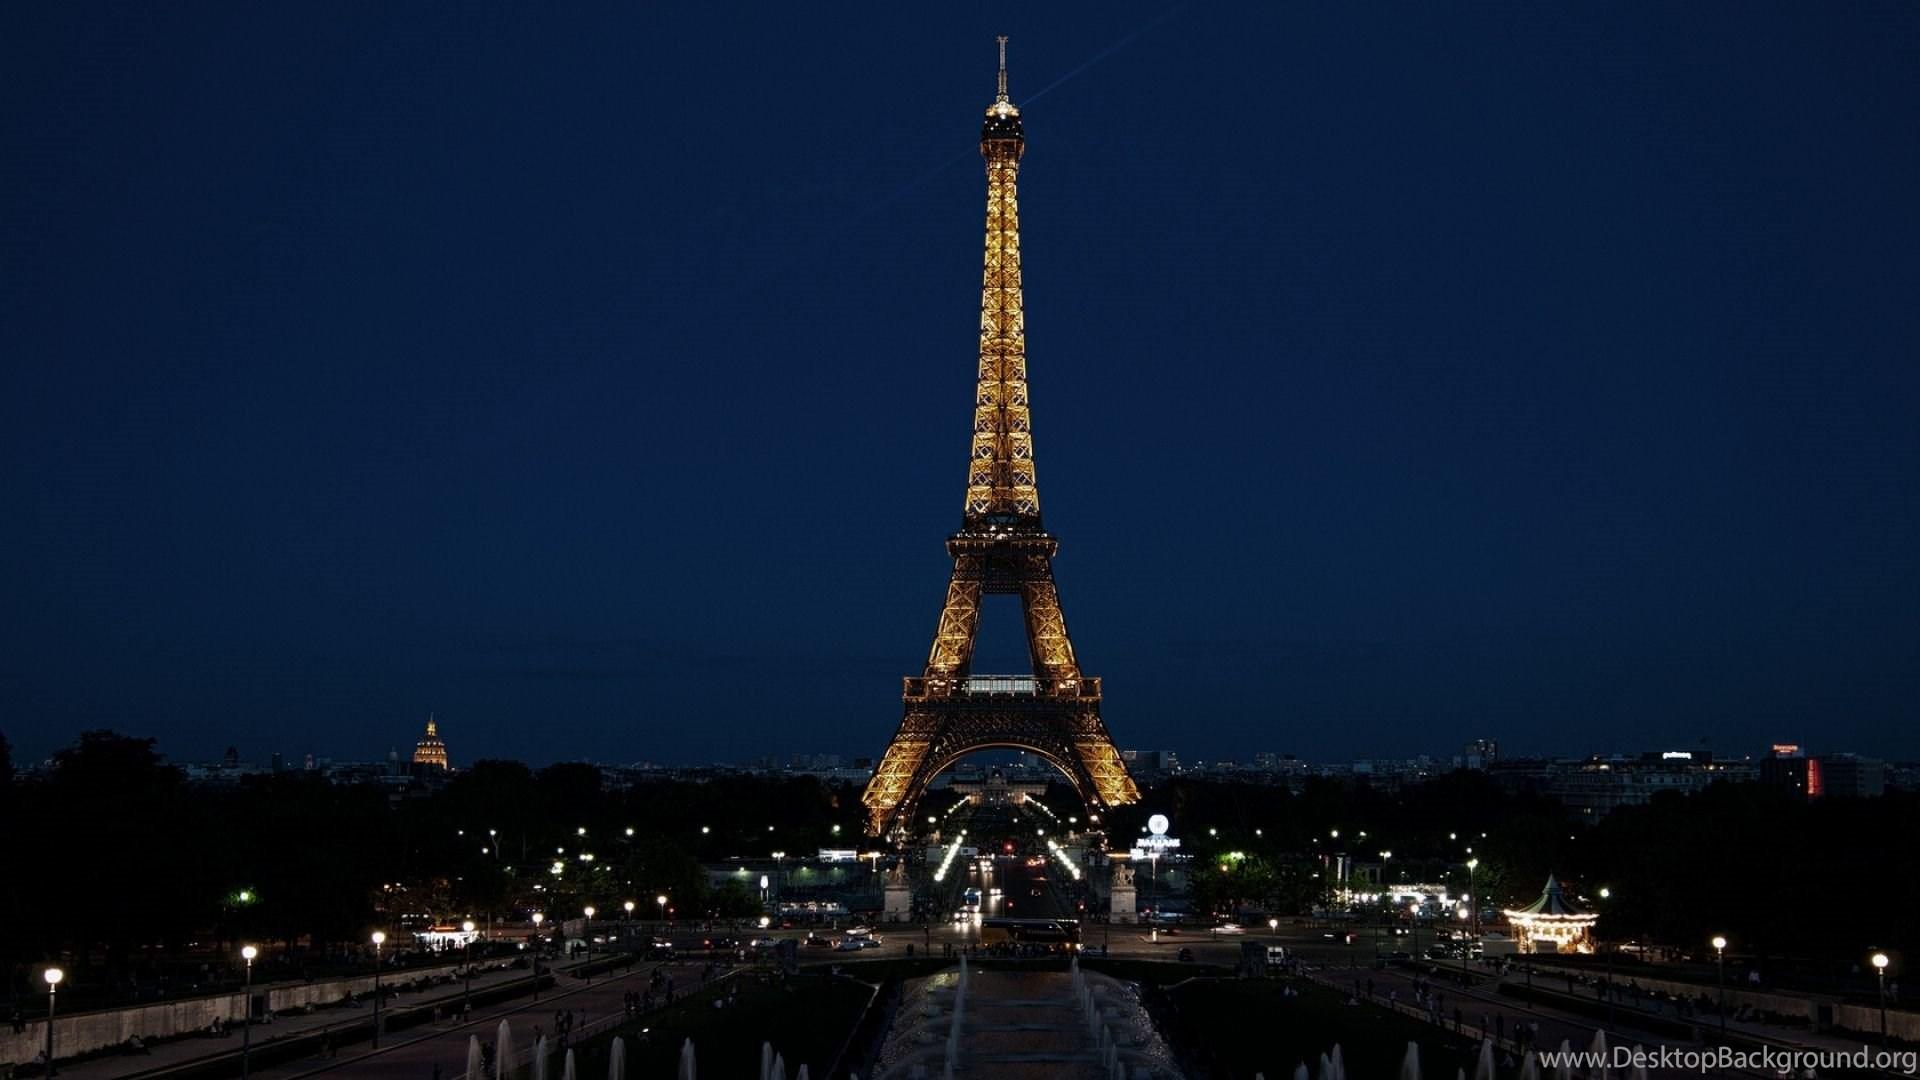 Full HD 1080p Paris Wallpapers Desktop Backgrounds 1920x1080